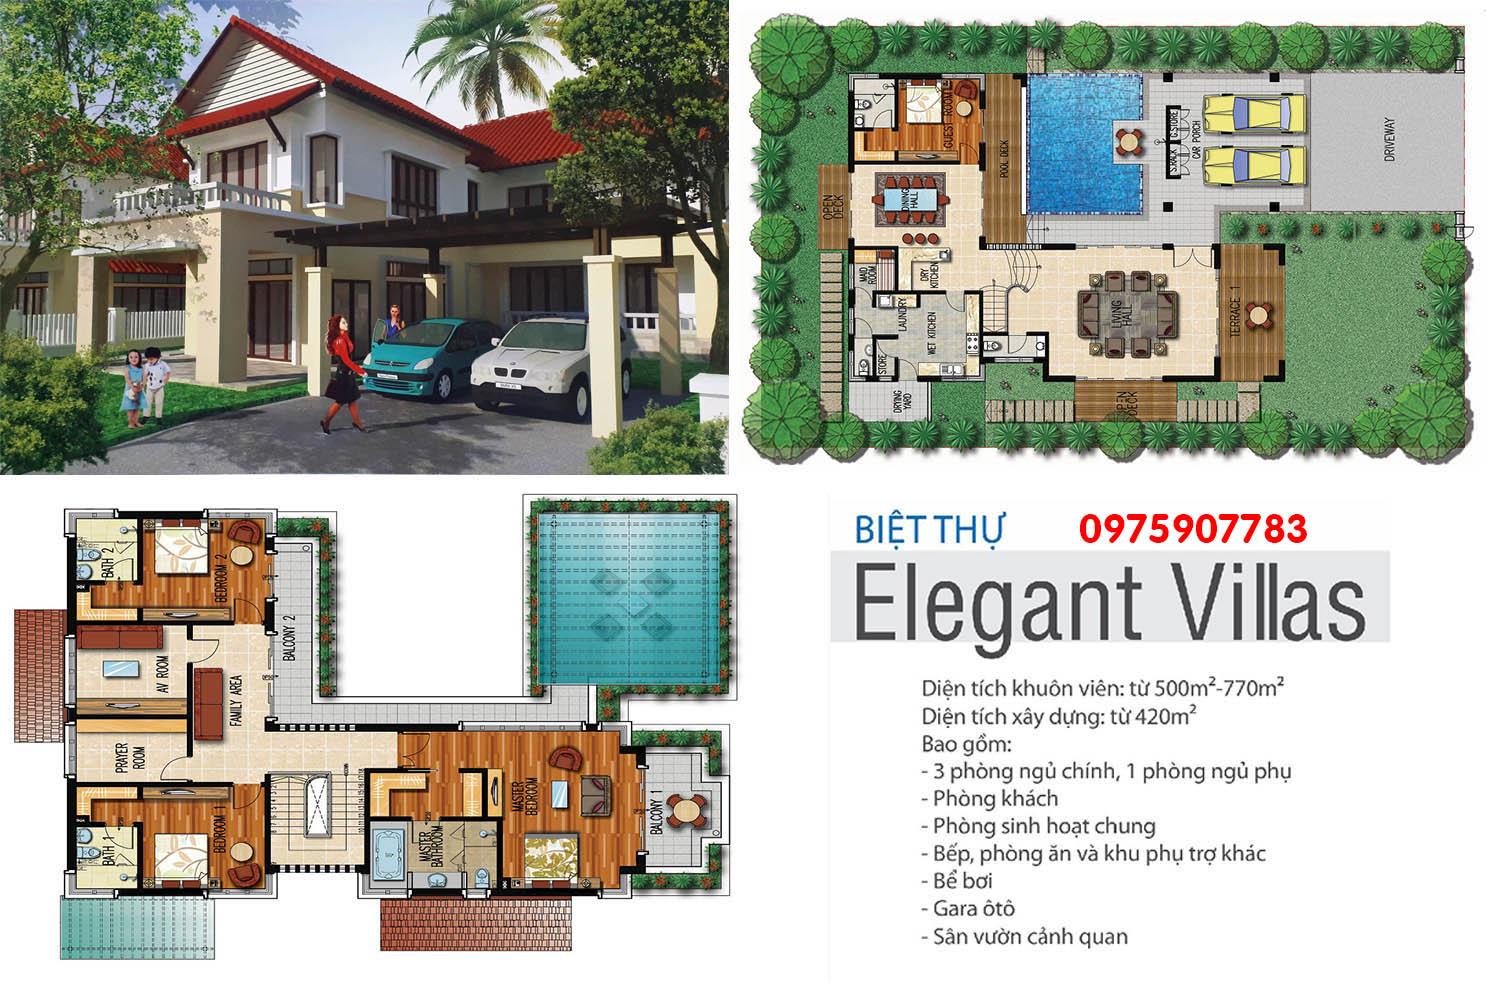 Xanh Villas - biệt thự Elegant